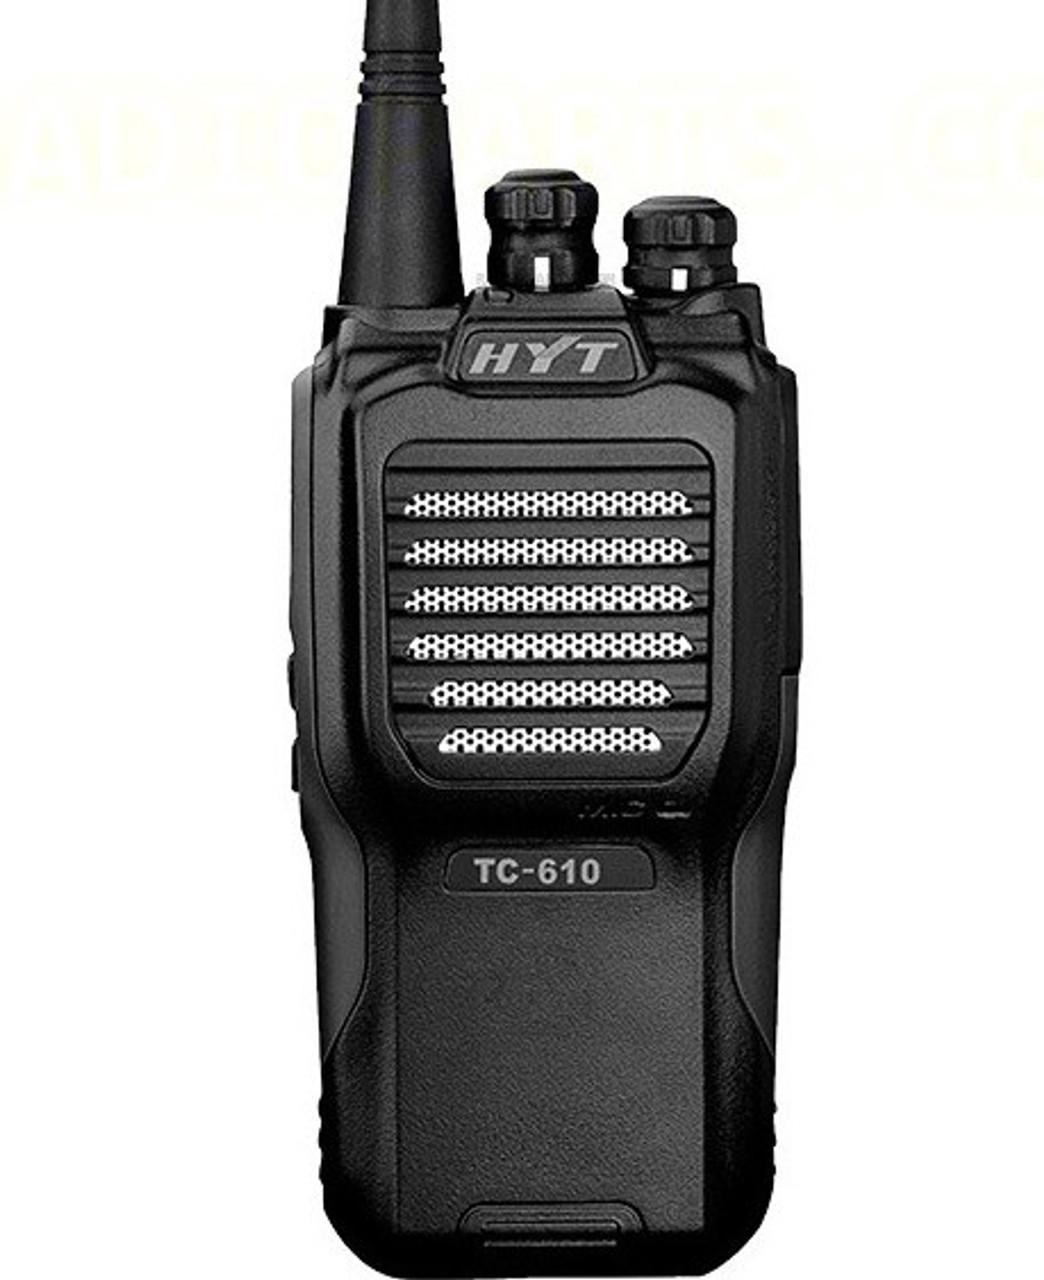 Hytera TC-610 5 Watt 16 Channel Two Way Radio with Black Grip